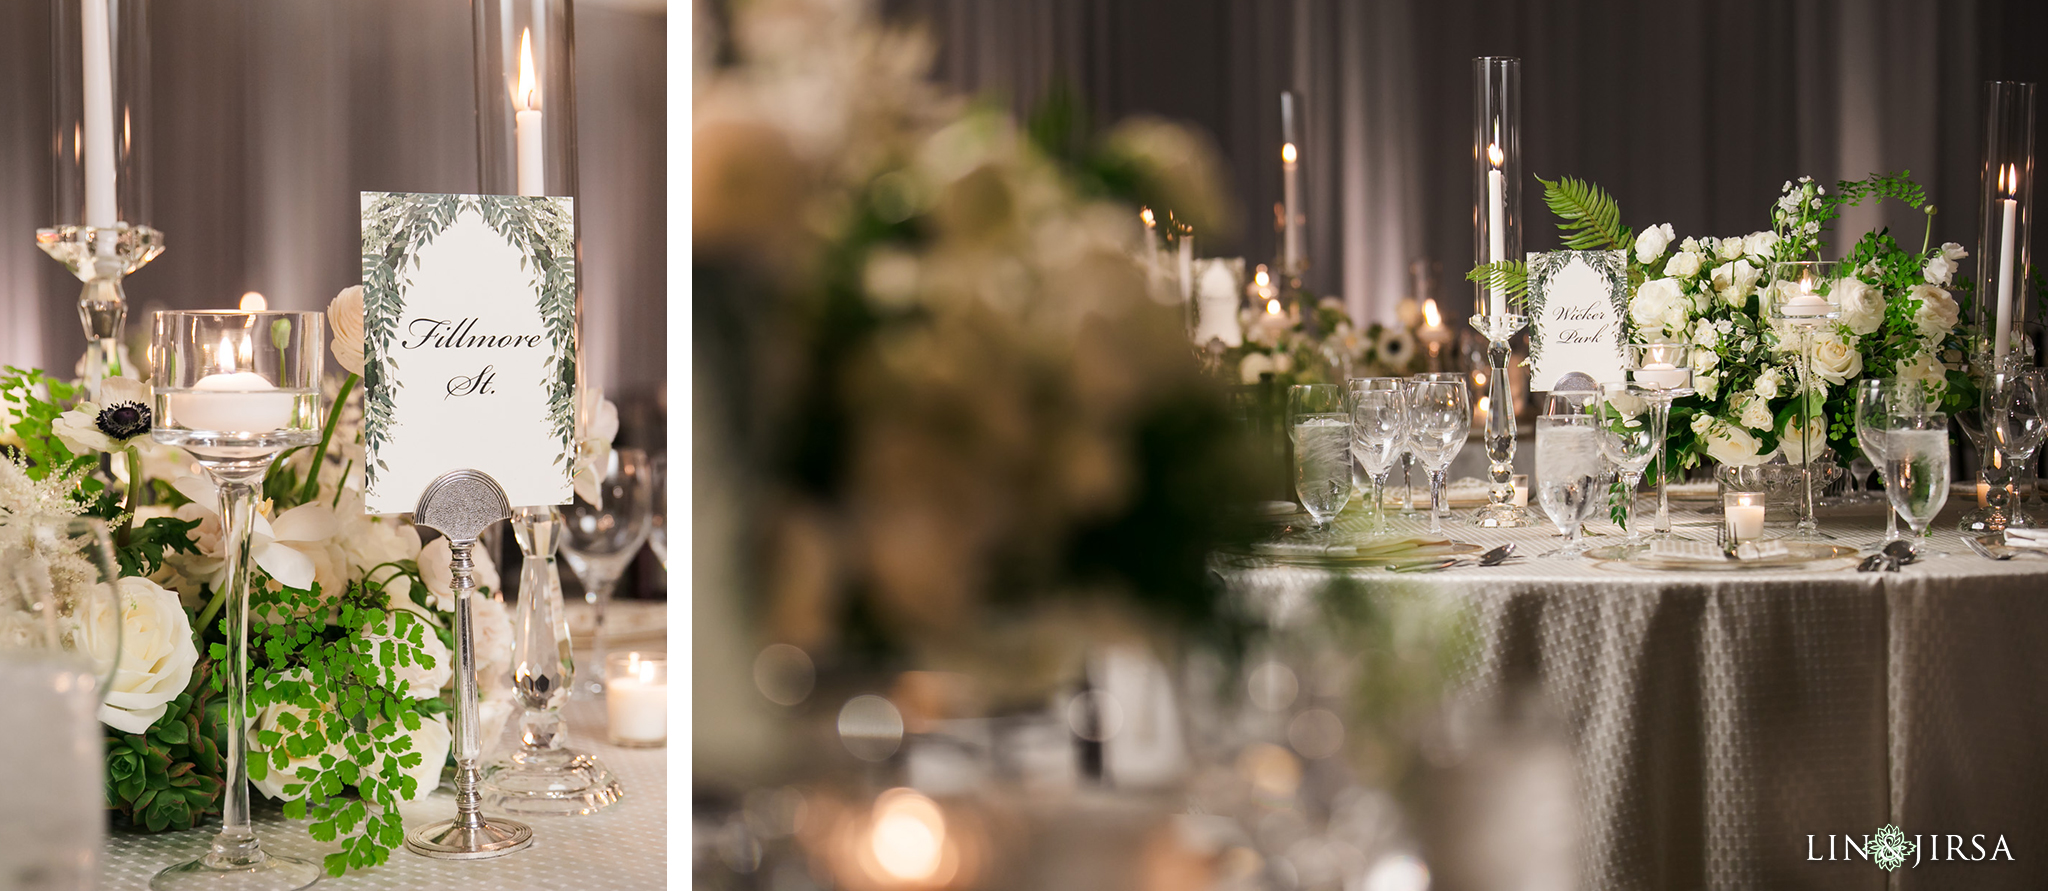 54 Ritz Carlton Laguna Niguel Indian Wedding Photography